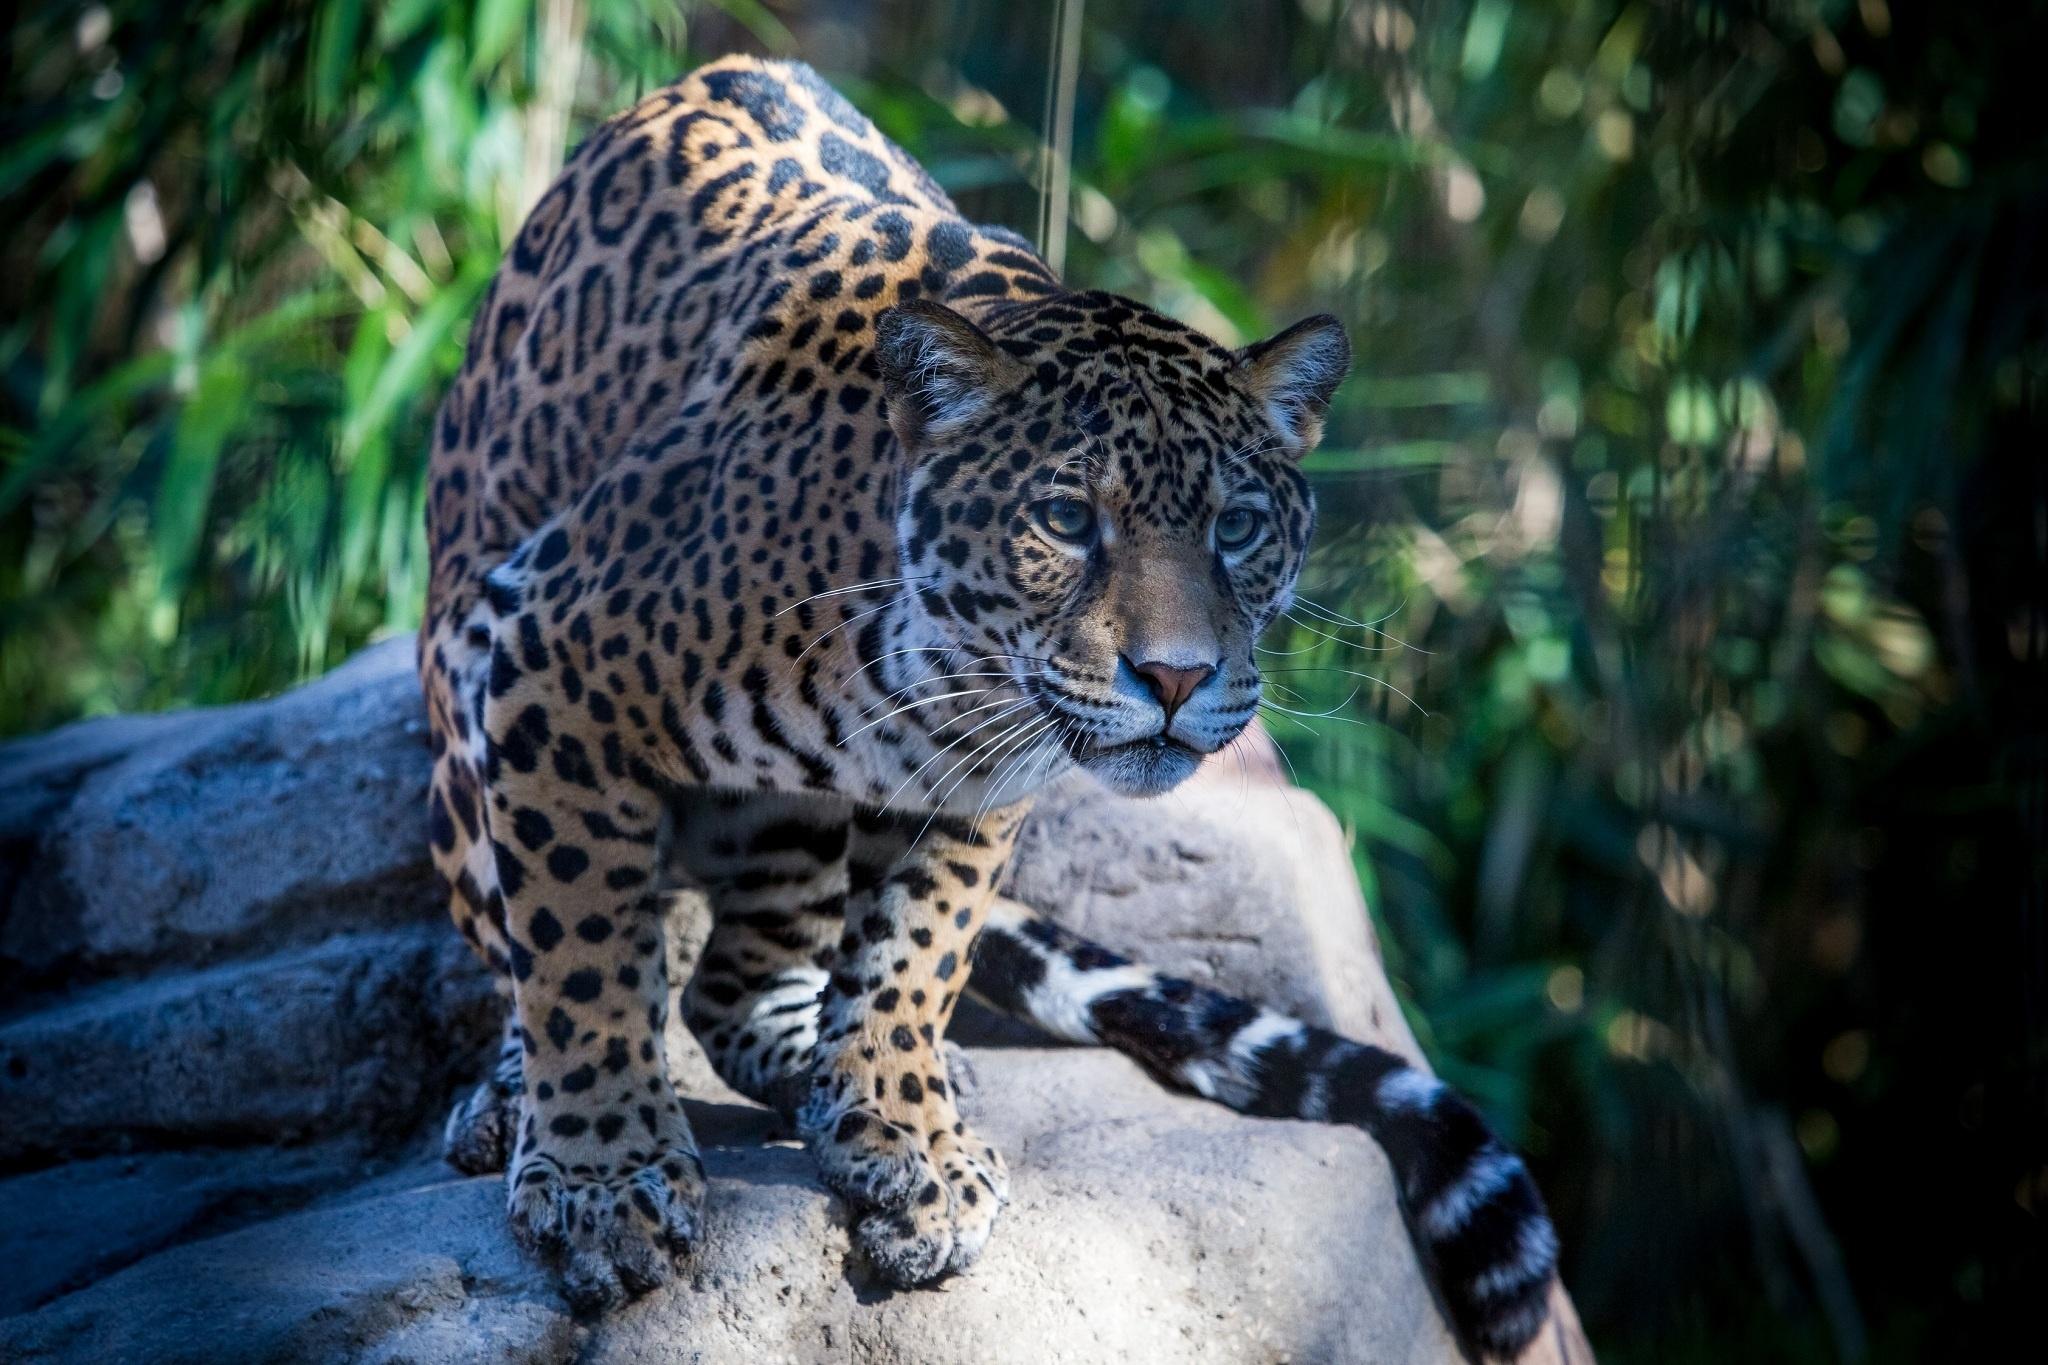 111459 download wallpaper Animals, Jaguar, Muzzle, Predator, Wild Cat, Wildcat screensavers and pictures for free